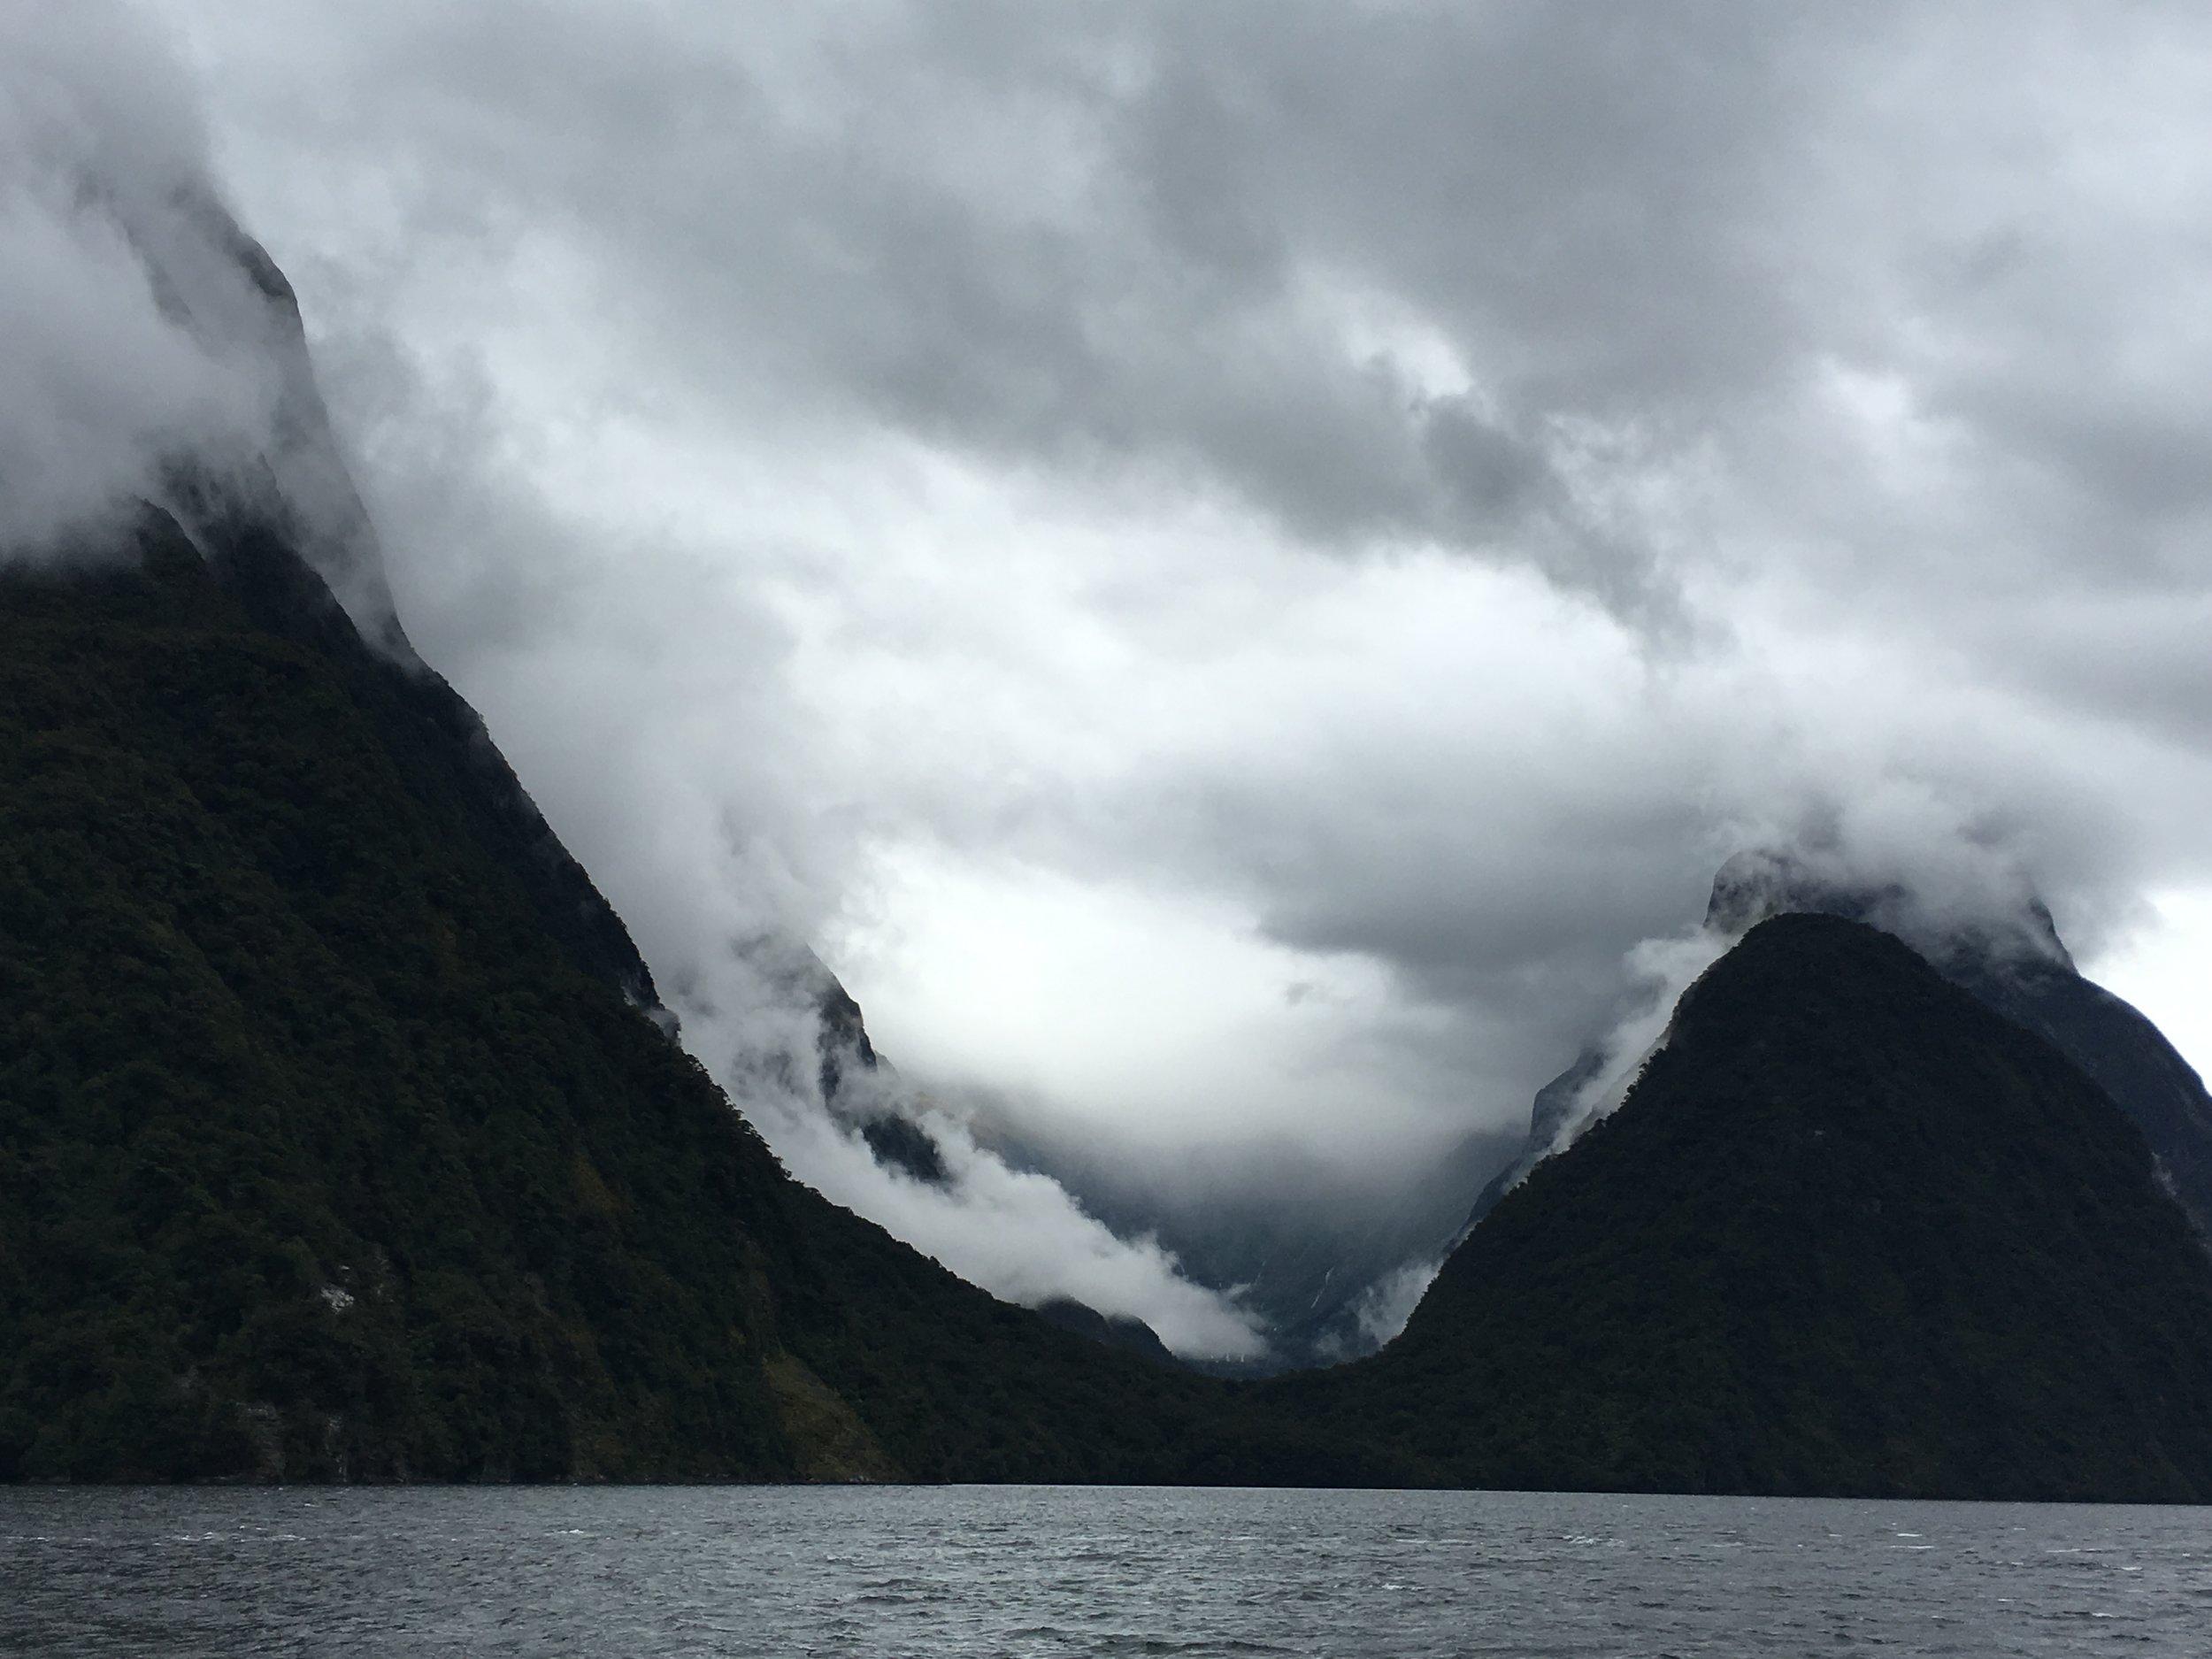 Mitre Peak hiding under the clouds